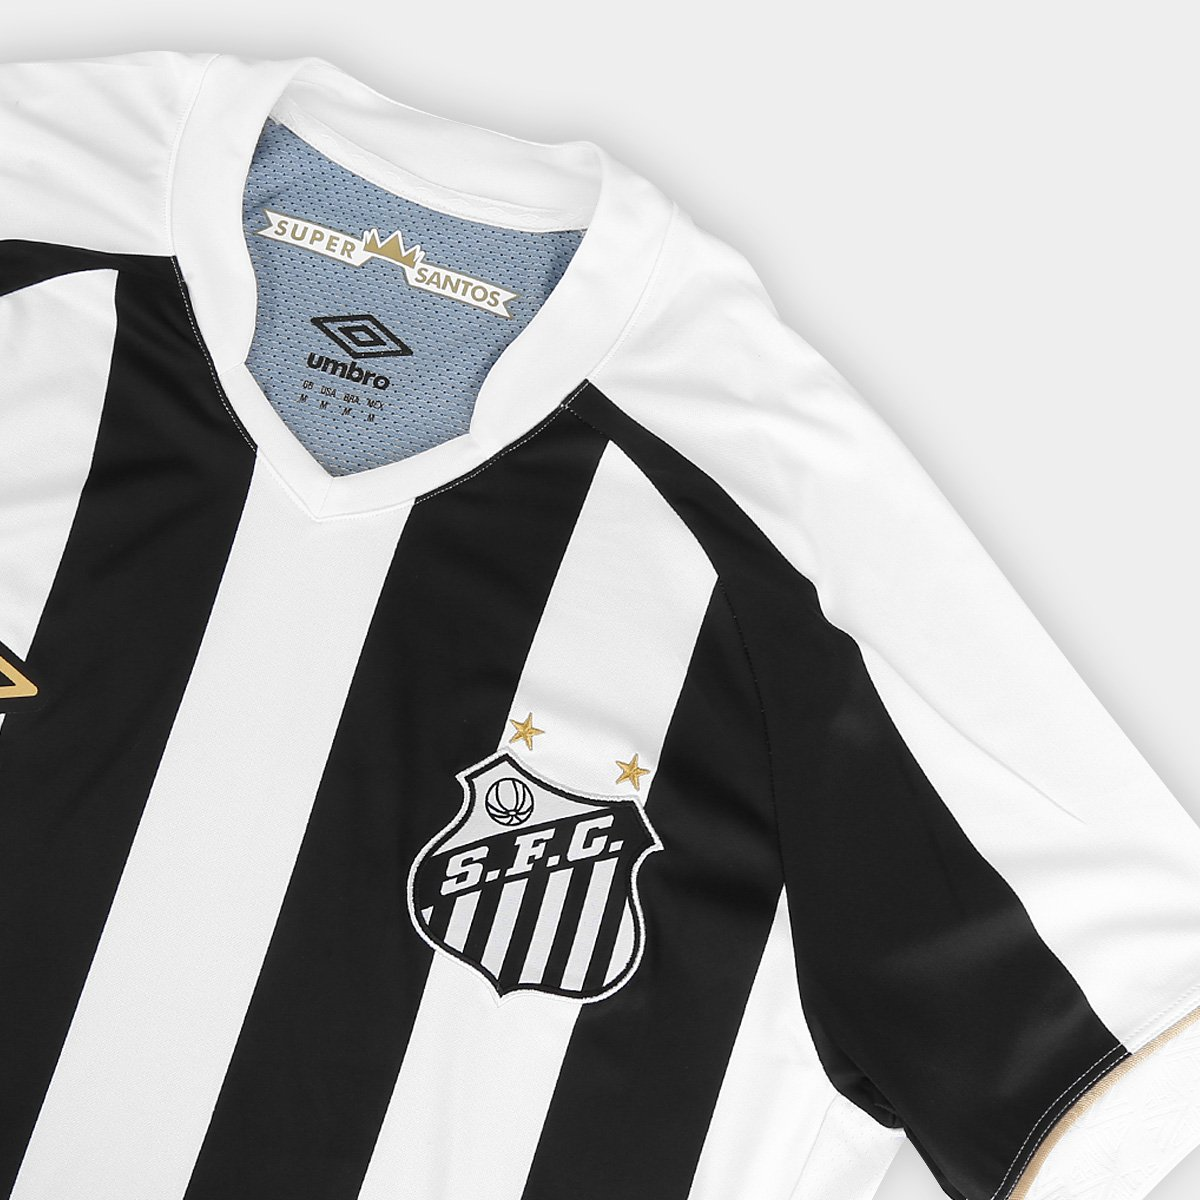 efc9dddce6 Camisa Santos II 2018 s n° Torcedor Umbro Masculina - Branco e Preto ...